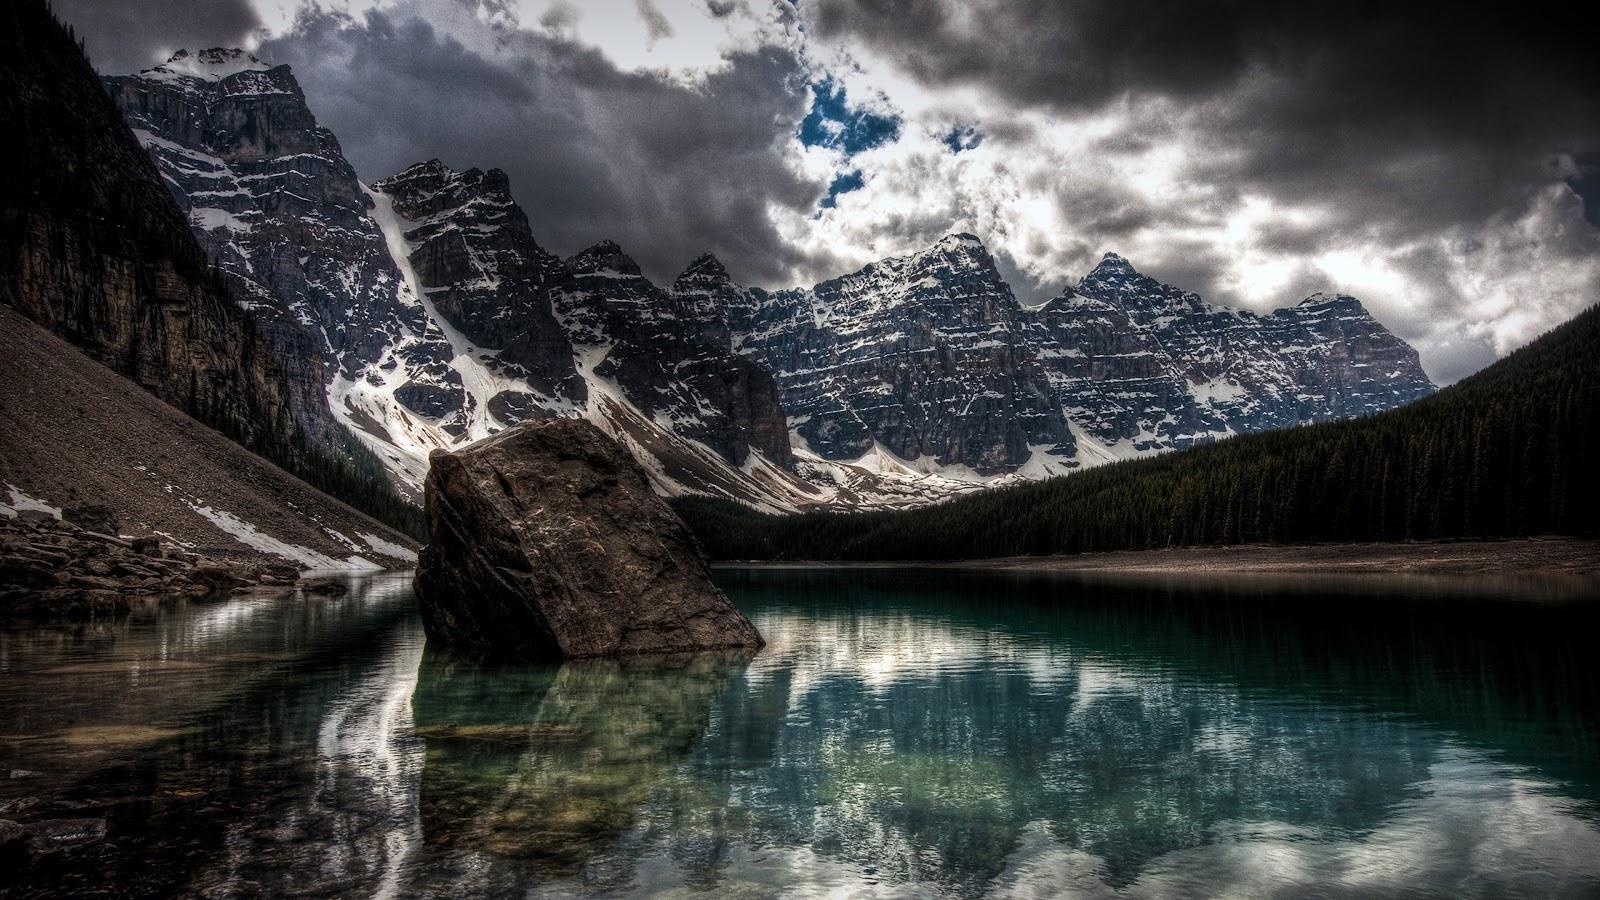 Lake, Mountains, Nature, Scenery, 4K, 3840x2160, #11 Wallpaper